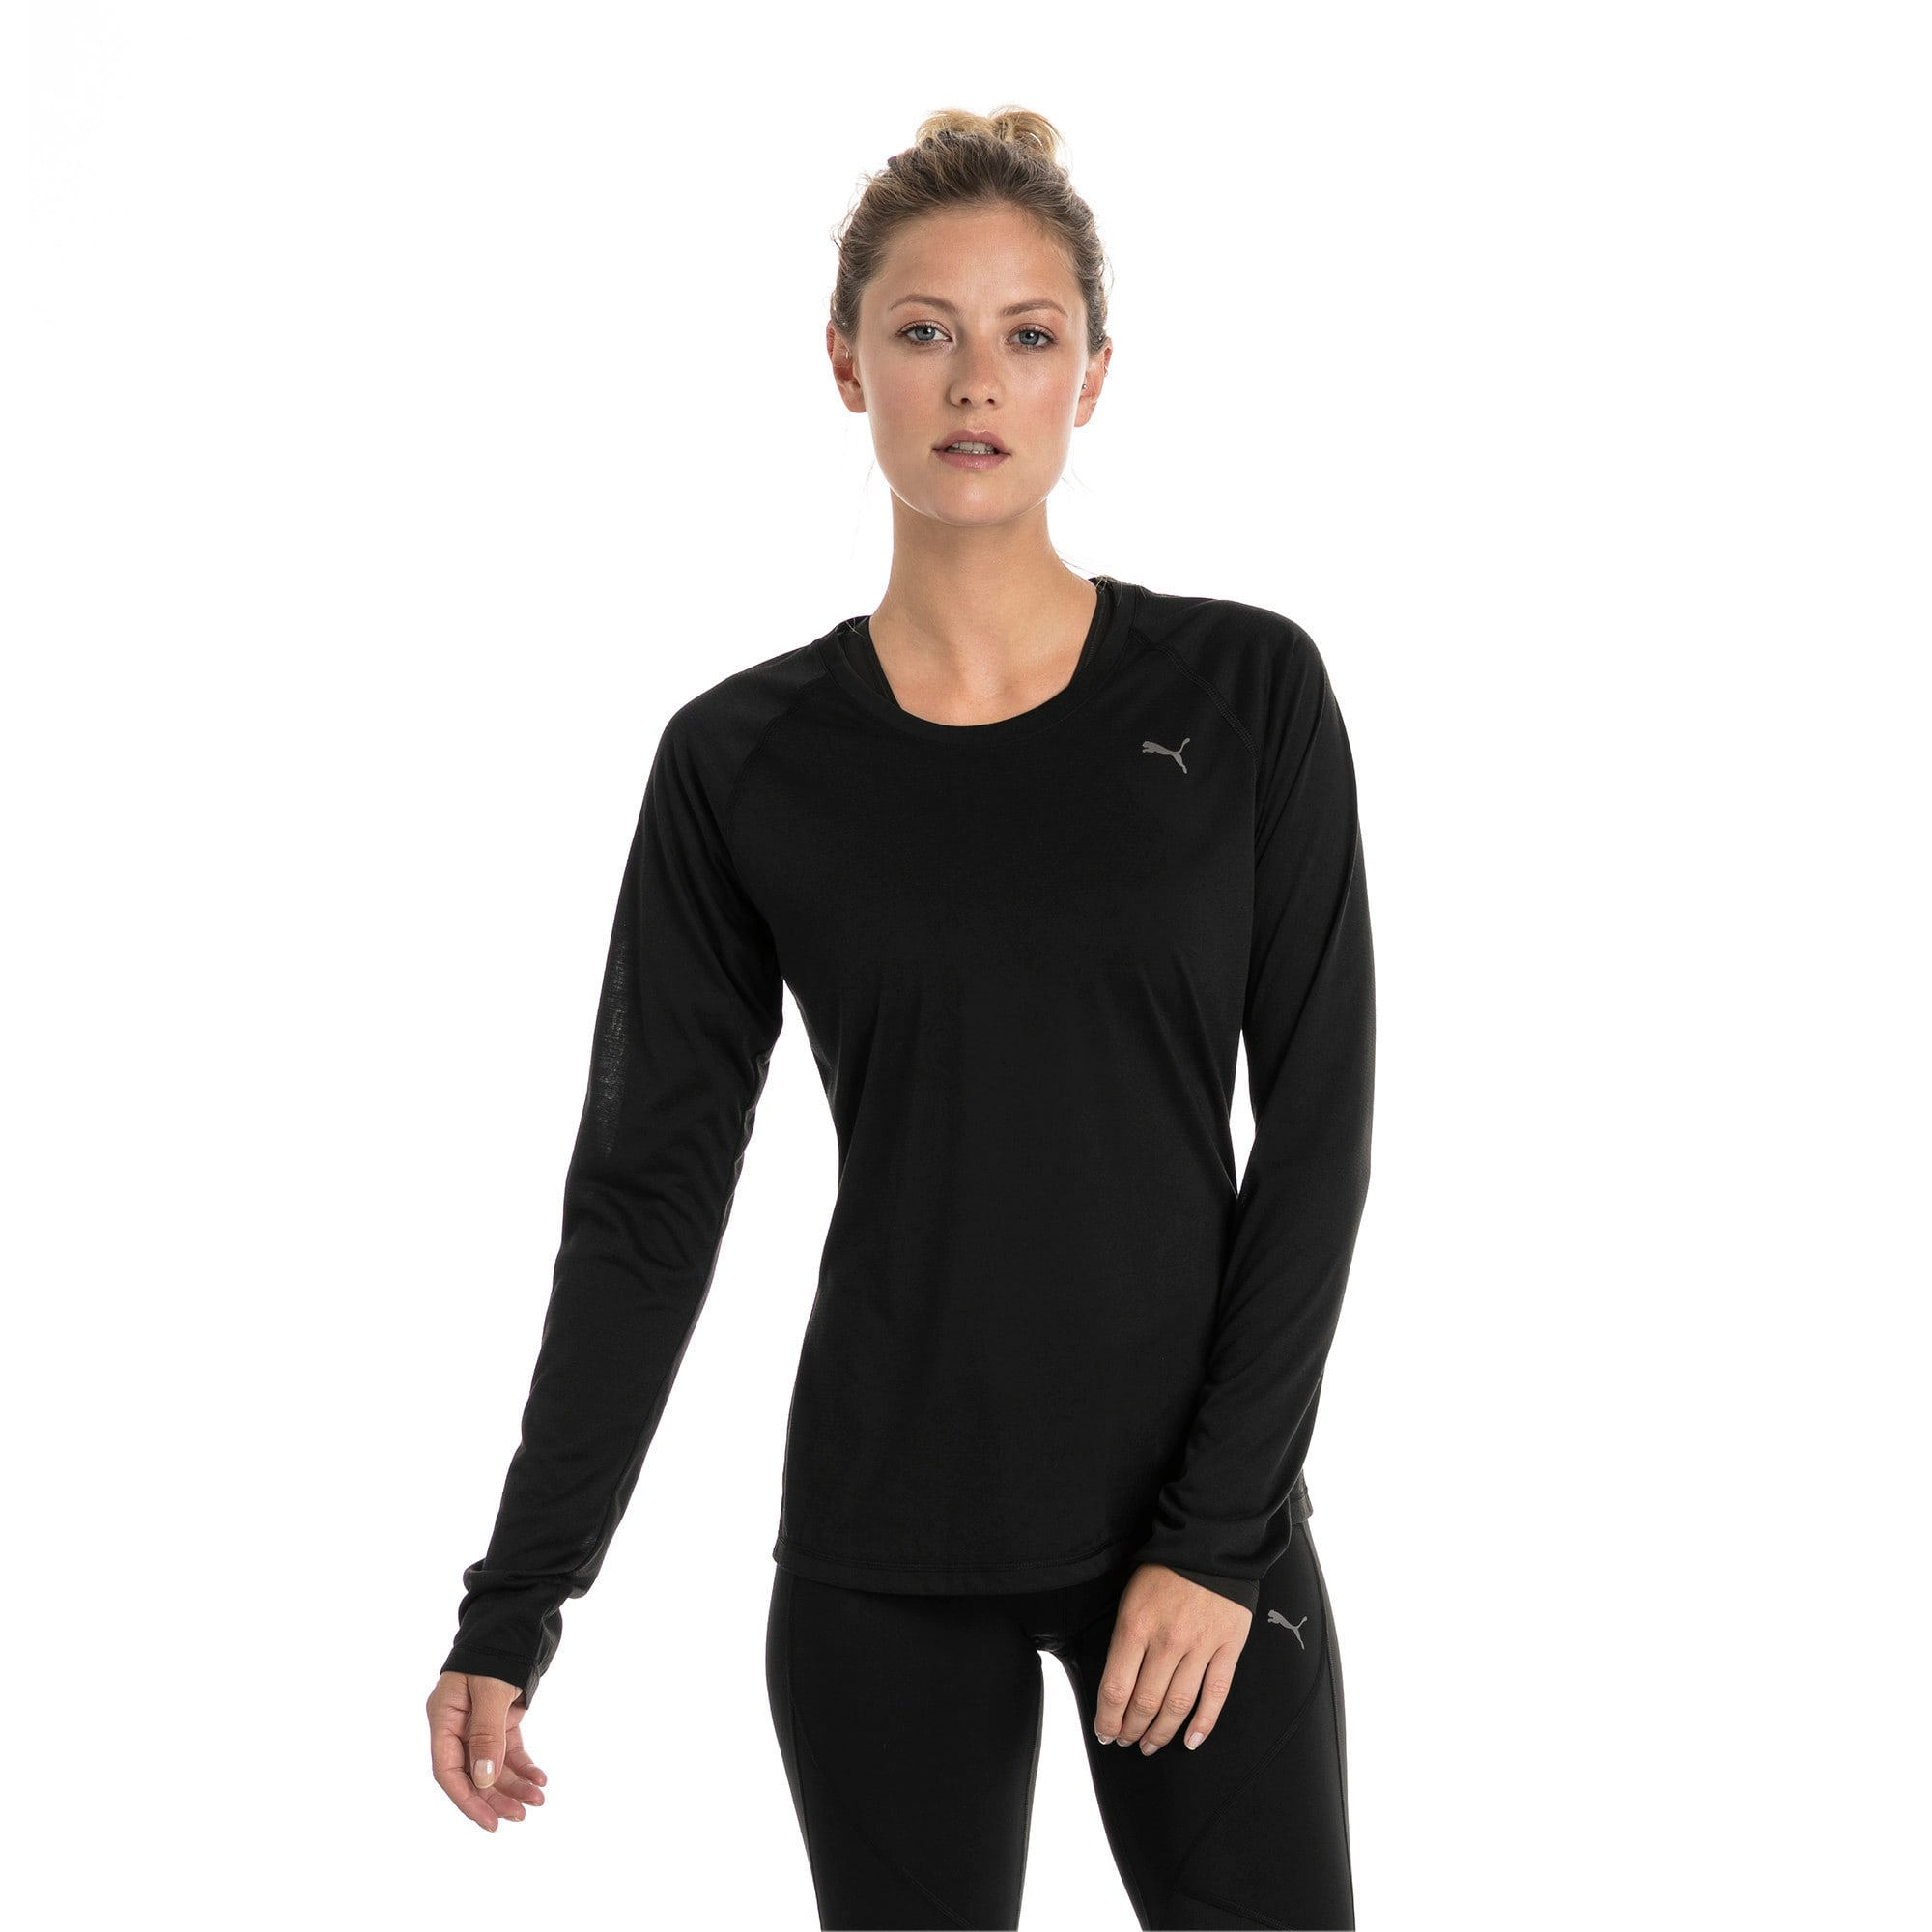 Thumbnail 1 of Running Women's IGNITE Long Sleeve, Puma Black, medium-IND